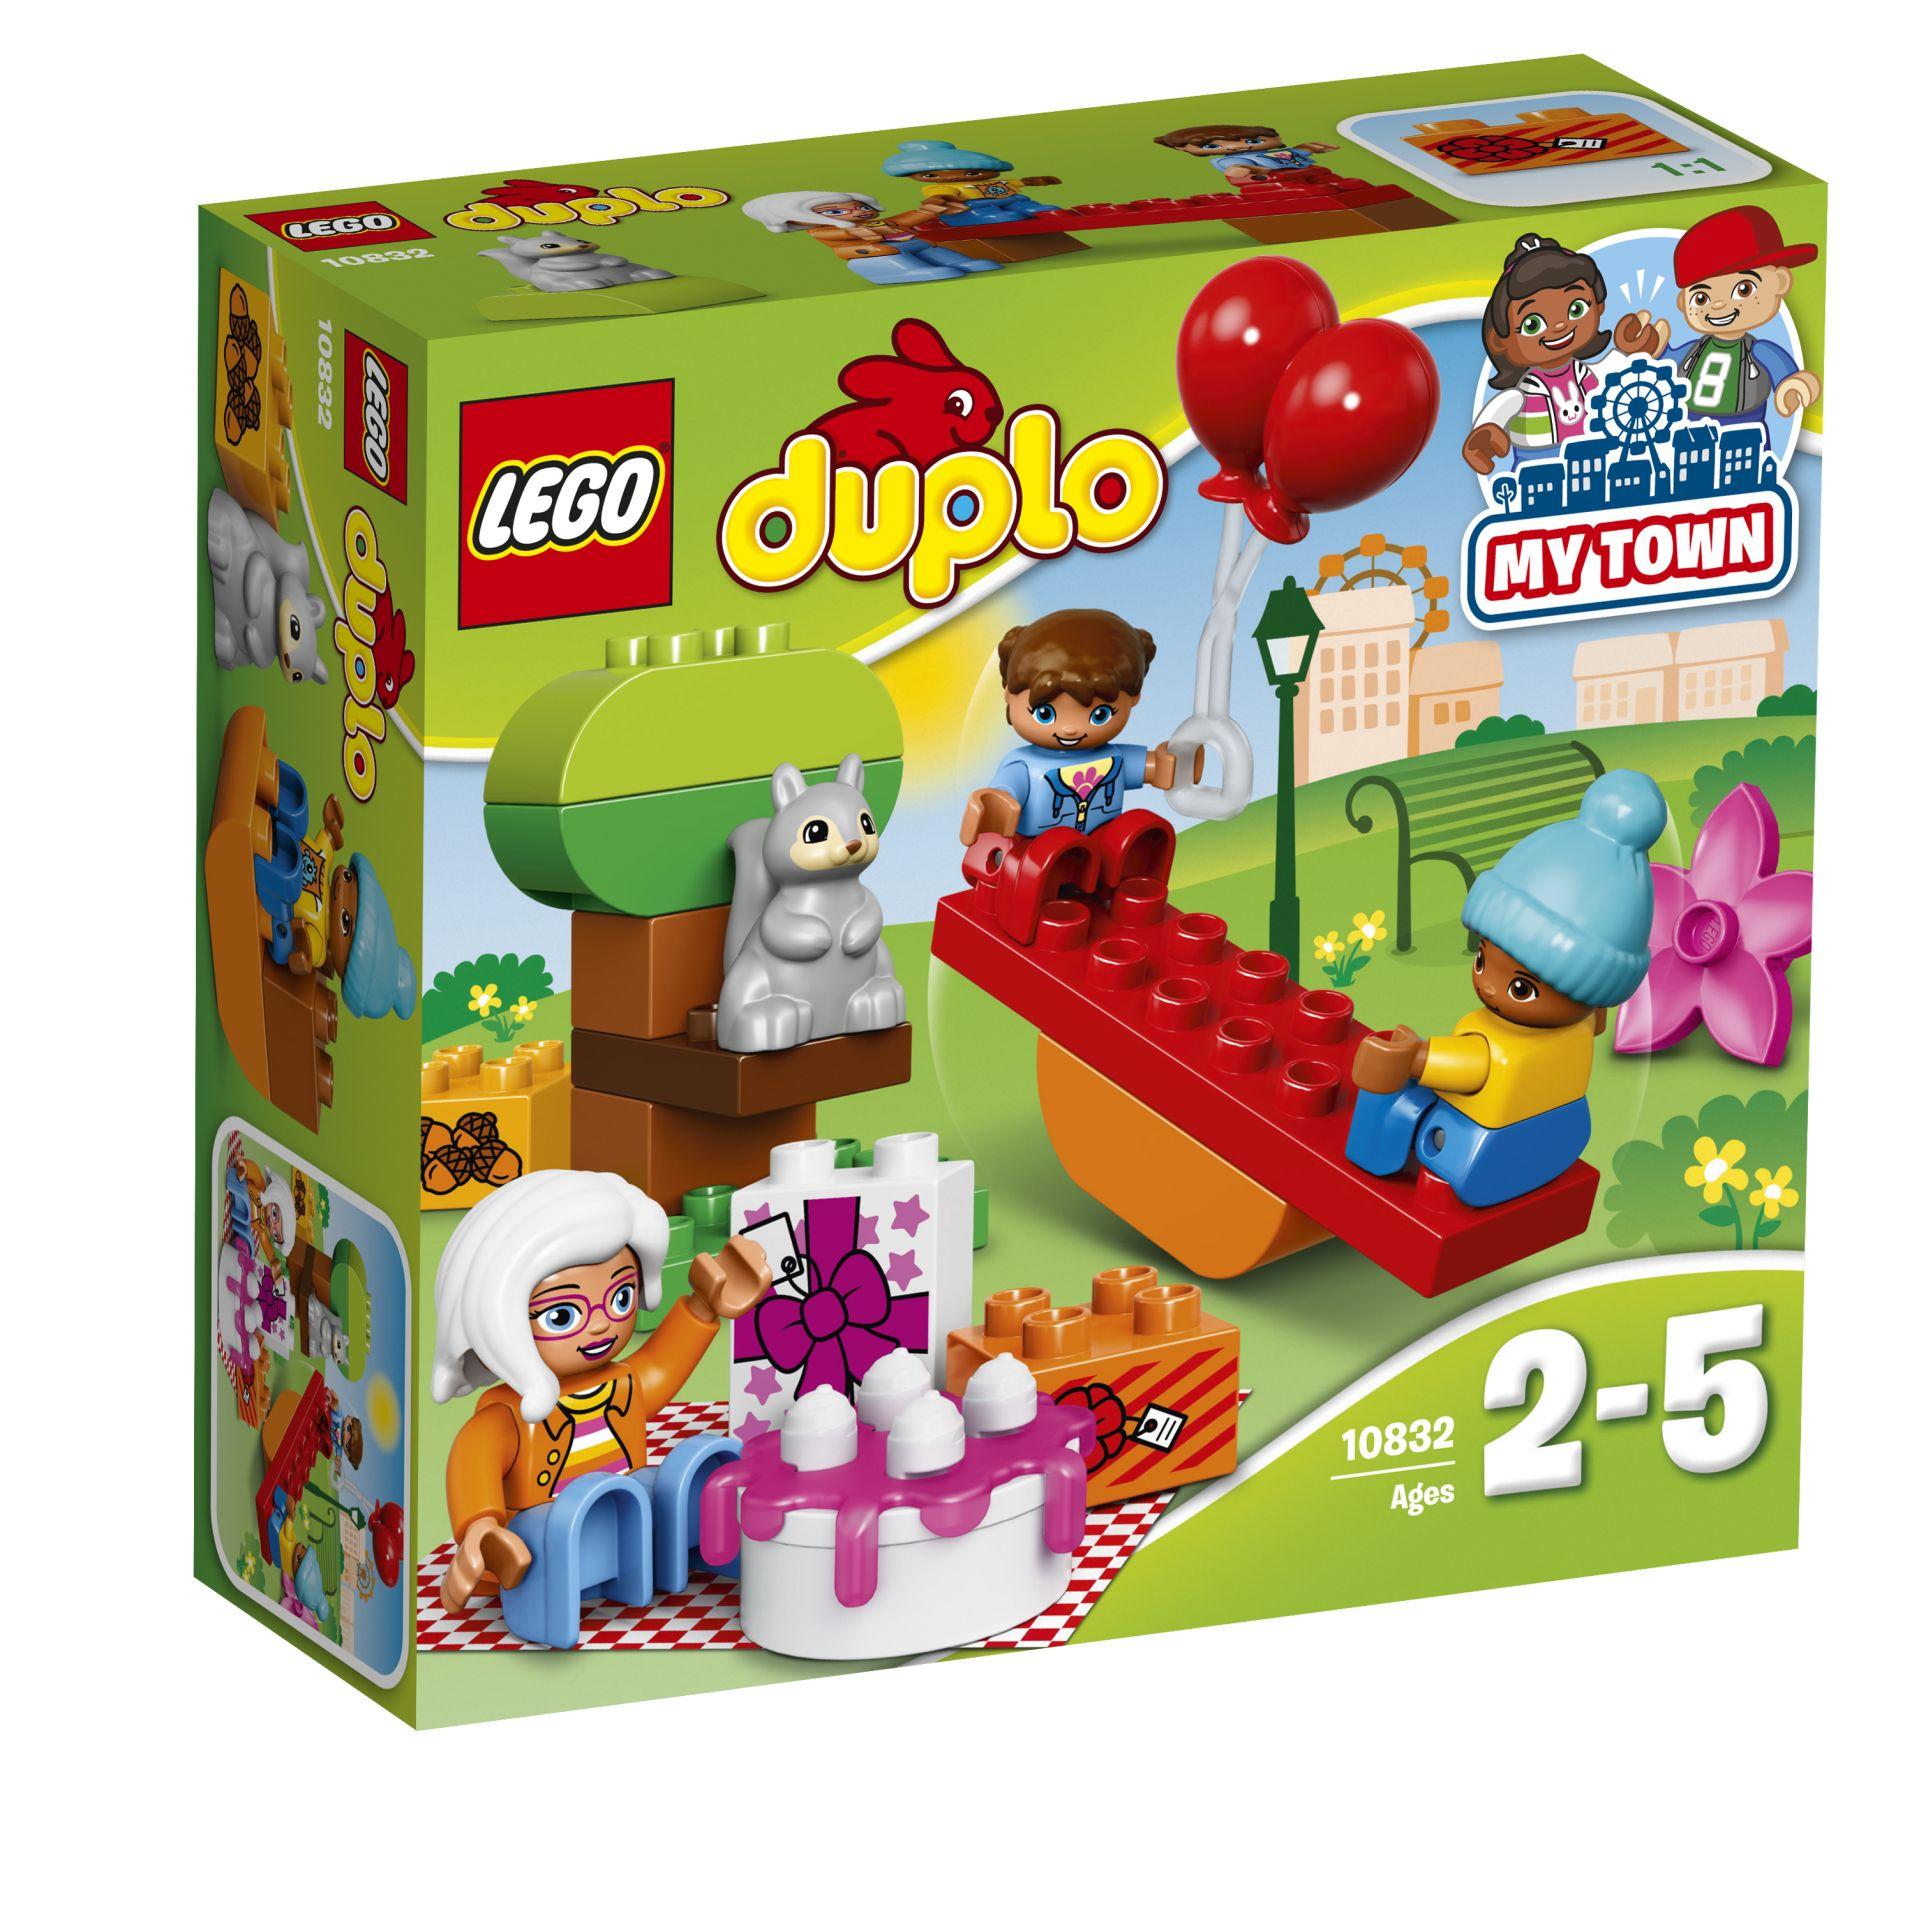 LEGO Duplo Birthday Picnic - Buy at kidsroom